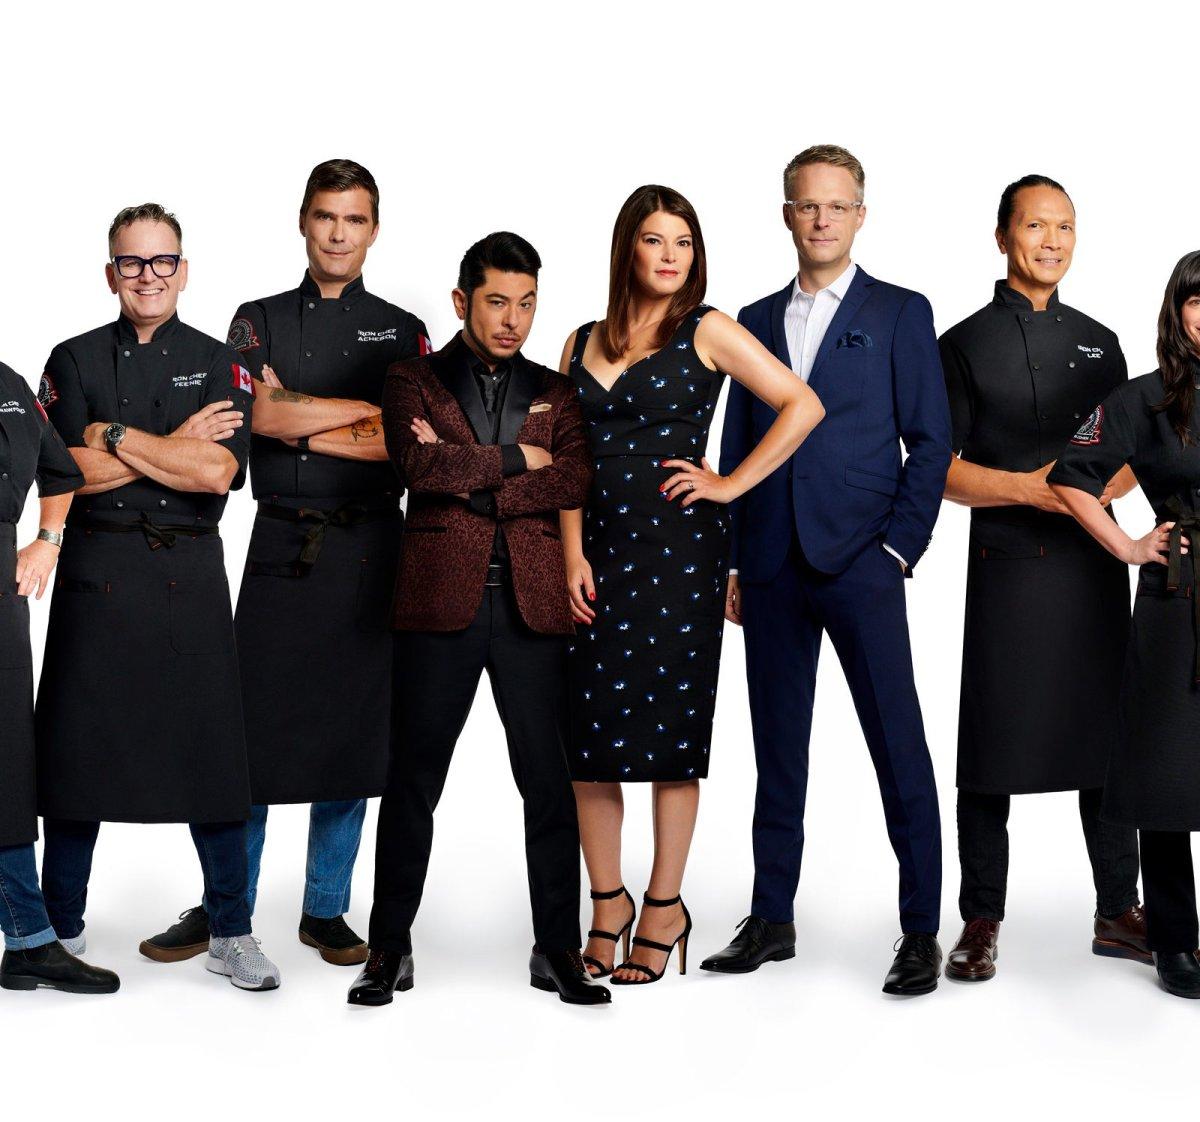 L to R: Lynn Crawford, Rob Feenie, Hugh Acheson, Jai West, Gail Simmons, Chris Nuttall-Smith, Susur Lee and Amanda Cohen for Iron Chef Canada.